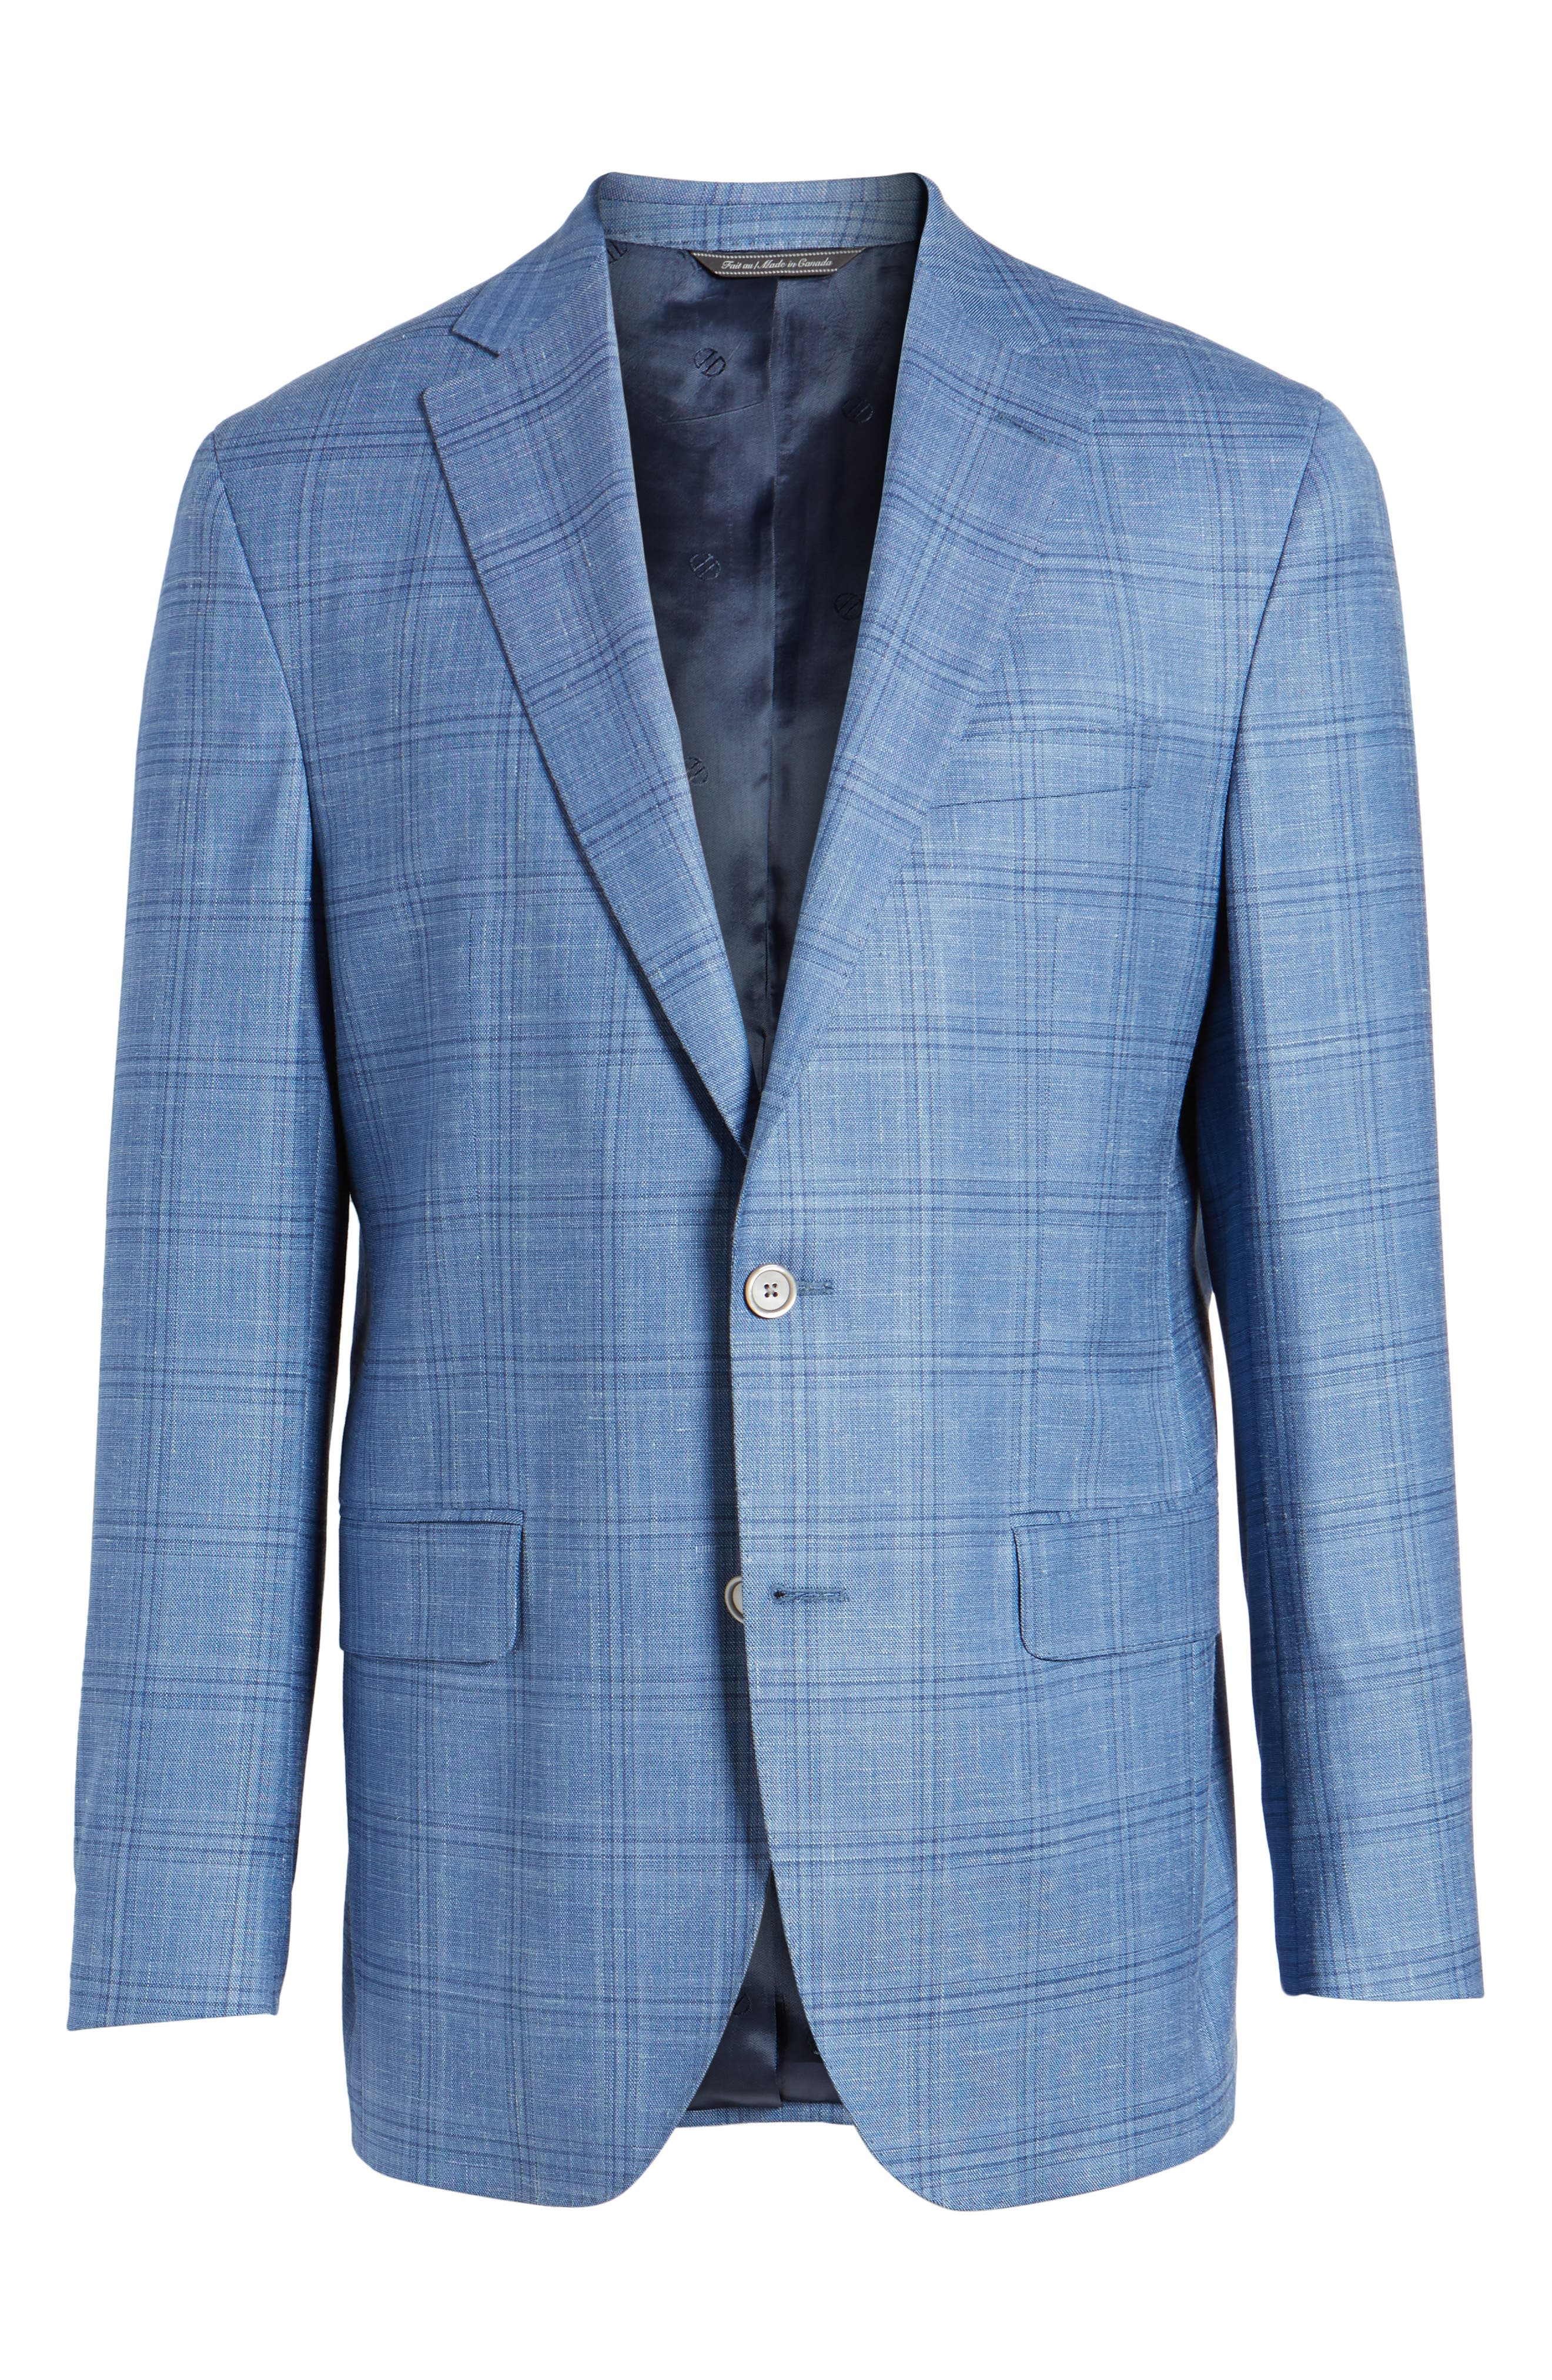 Arnold Classic Fit Plaid Wool Blend Sport Coat,                             Alternate thumbnail 6, color,                             Blue